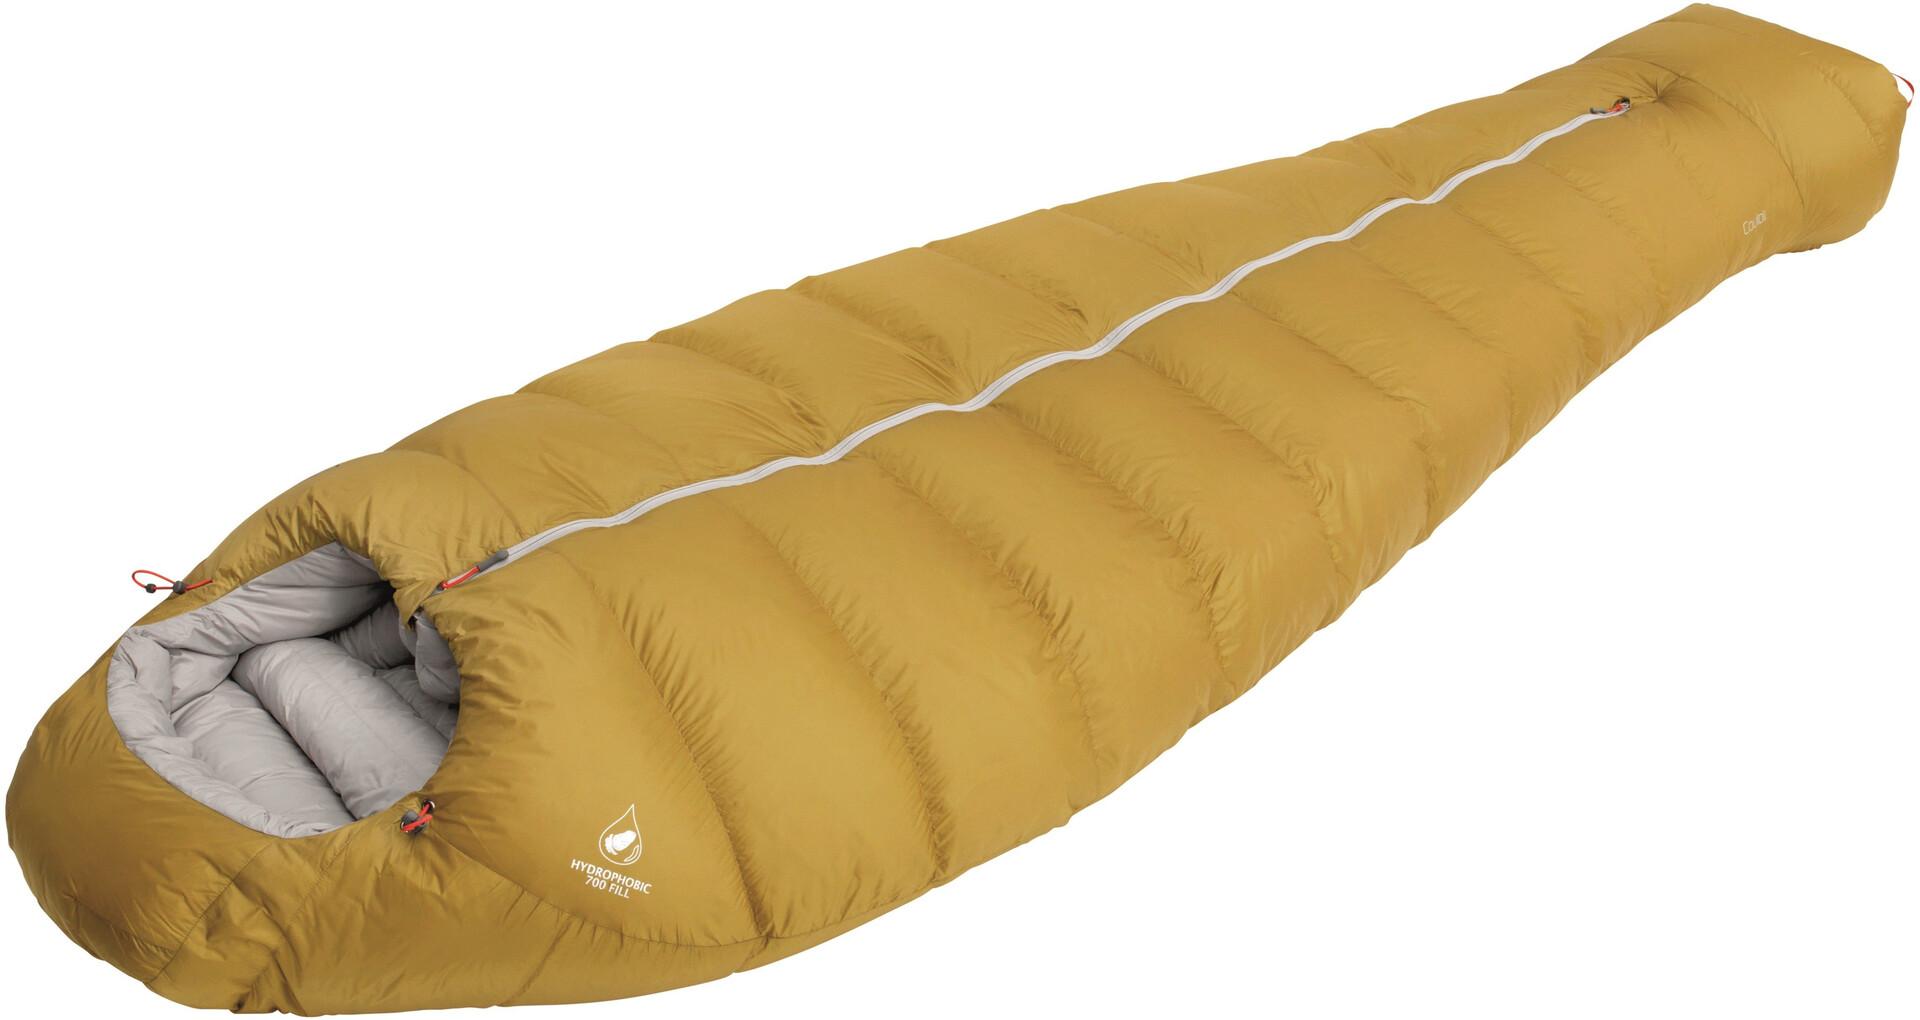 Black Diamond Couloir Klettergurt Test : Robens couloir sleeping bag campz